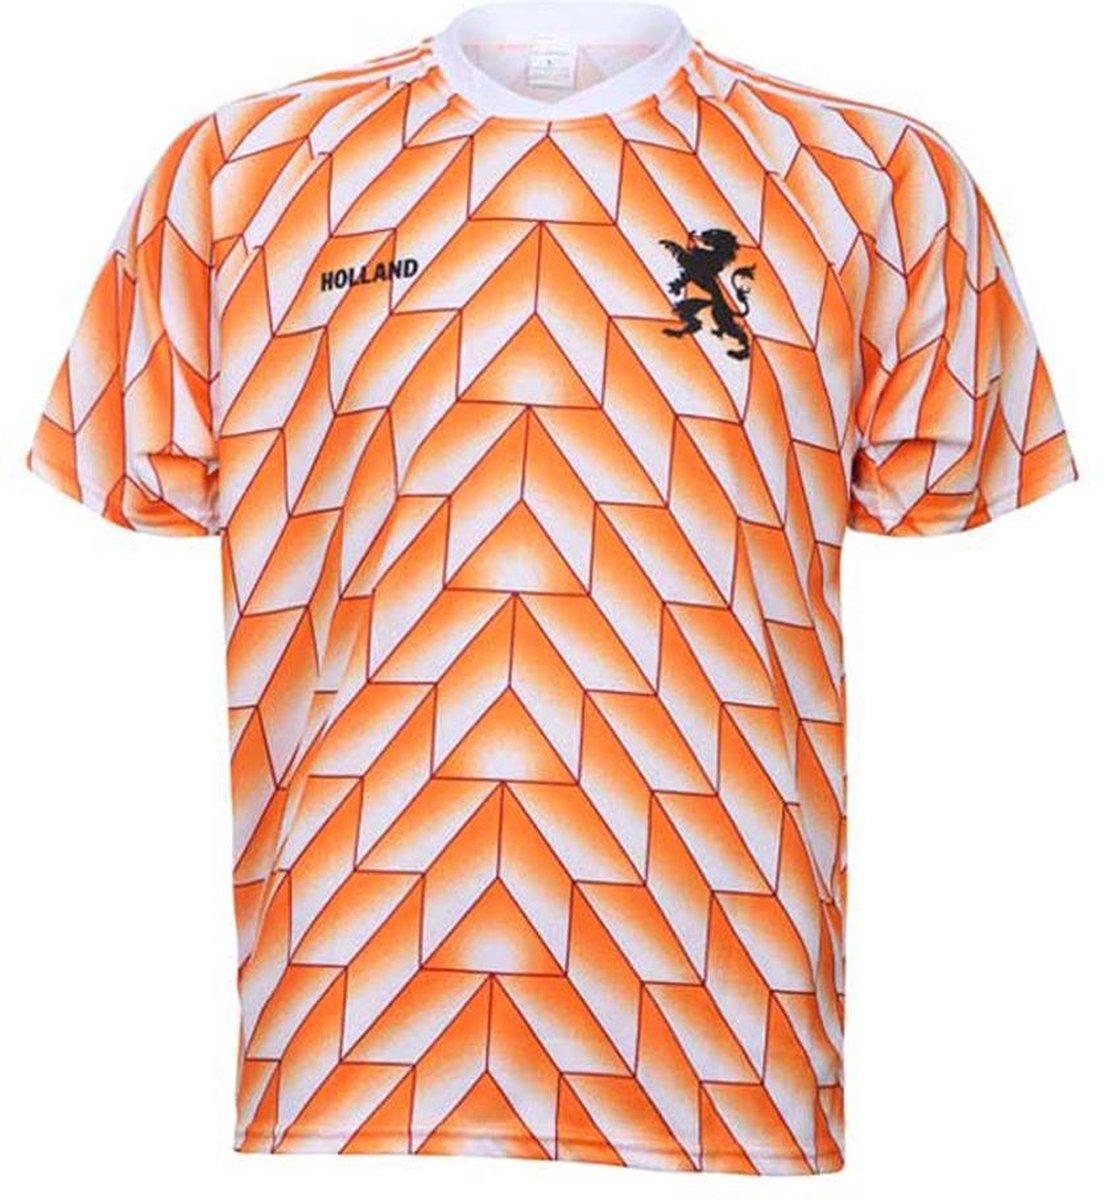 EK 88 Voetbalshirt 1988 Blanco-S